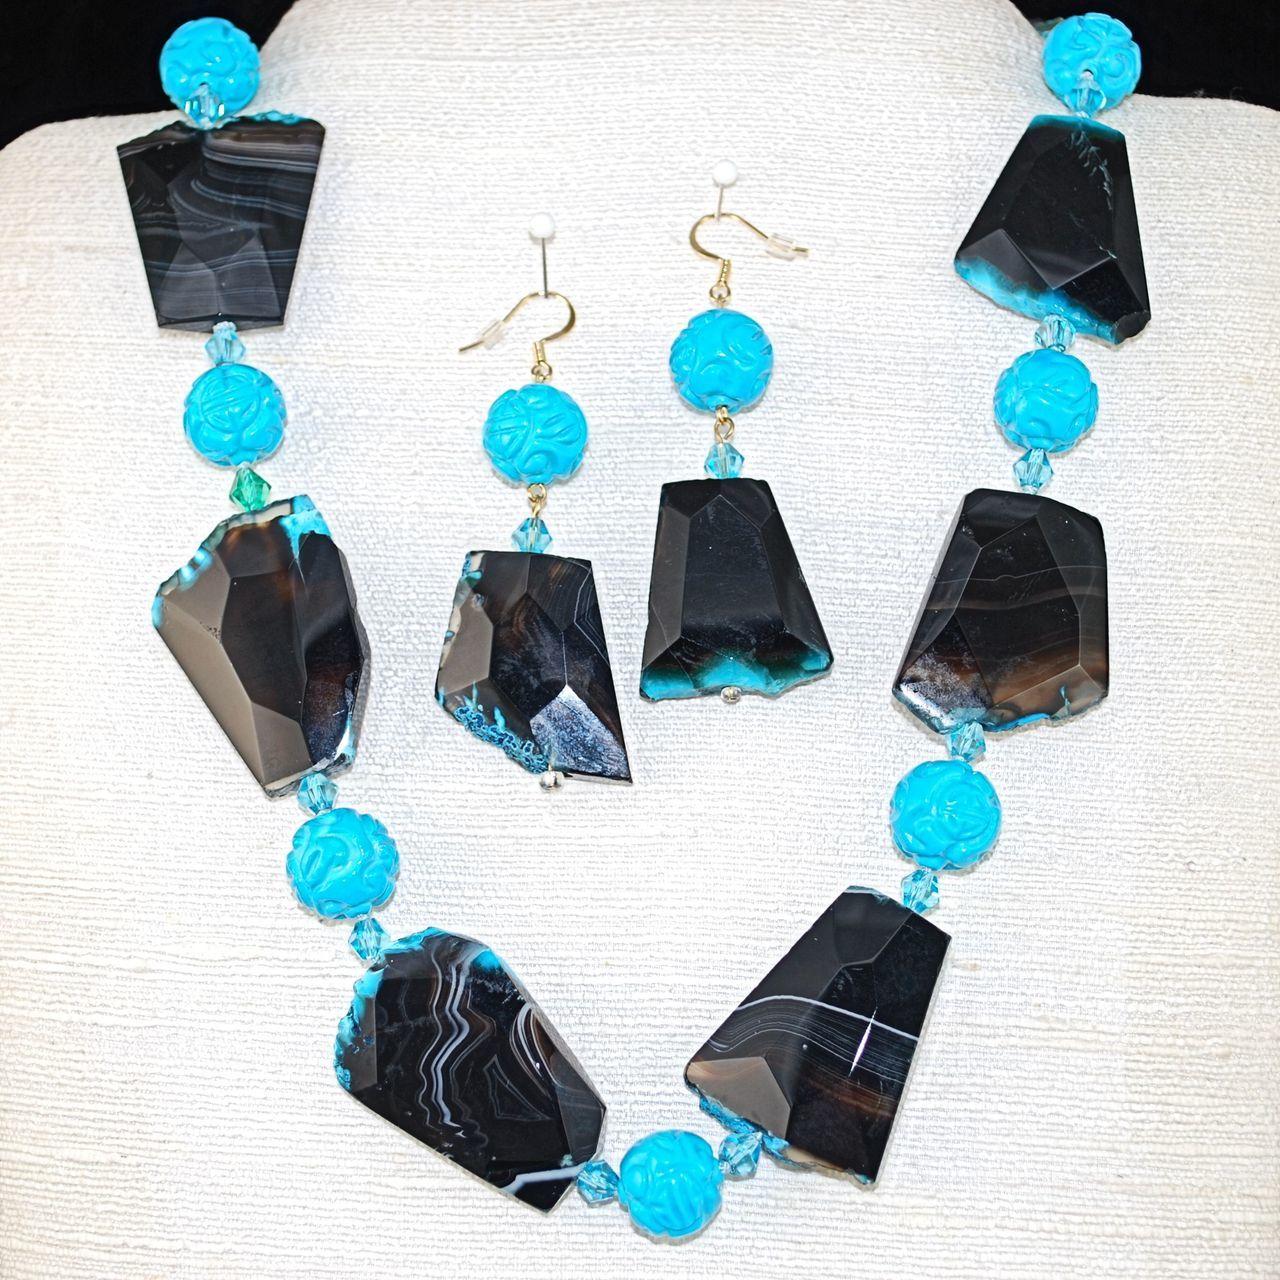 Enchanting Jewelry Creations image 50